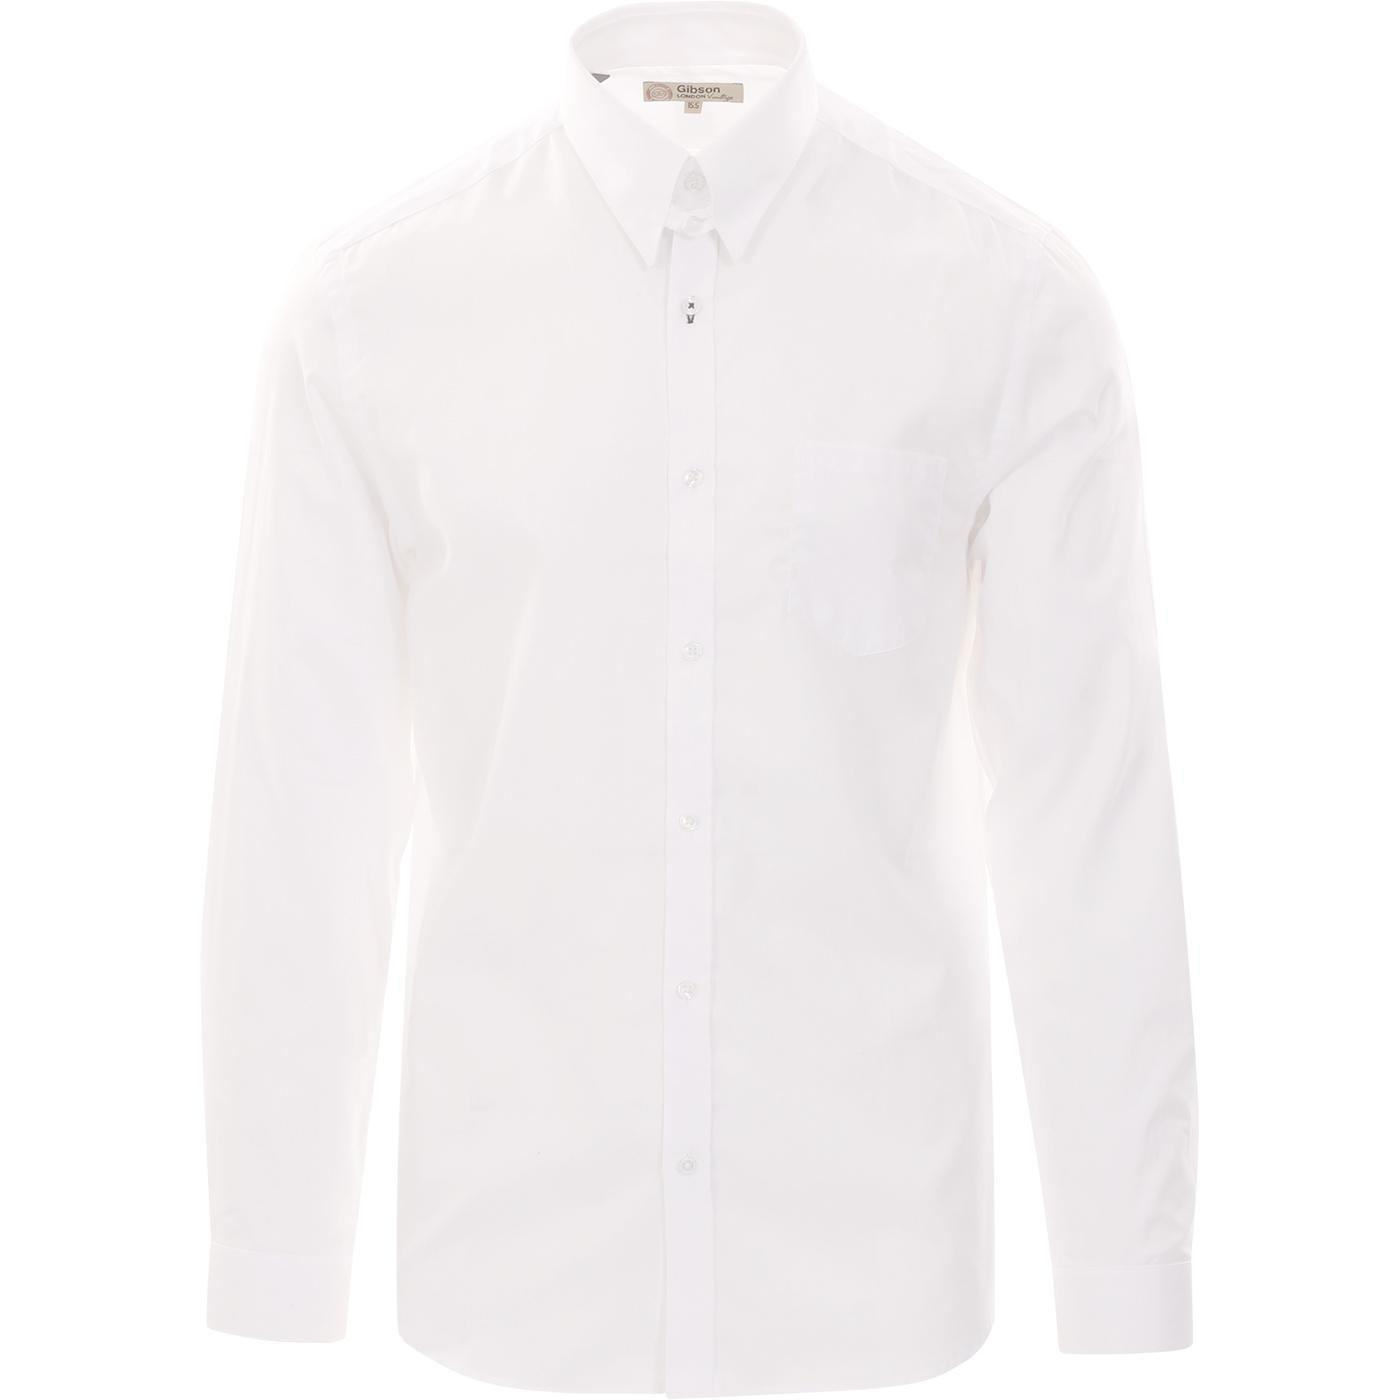 GIBSON LONDON Mod Smart Oxford Tab Collar Shirt